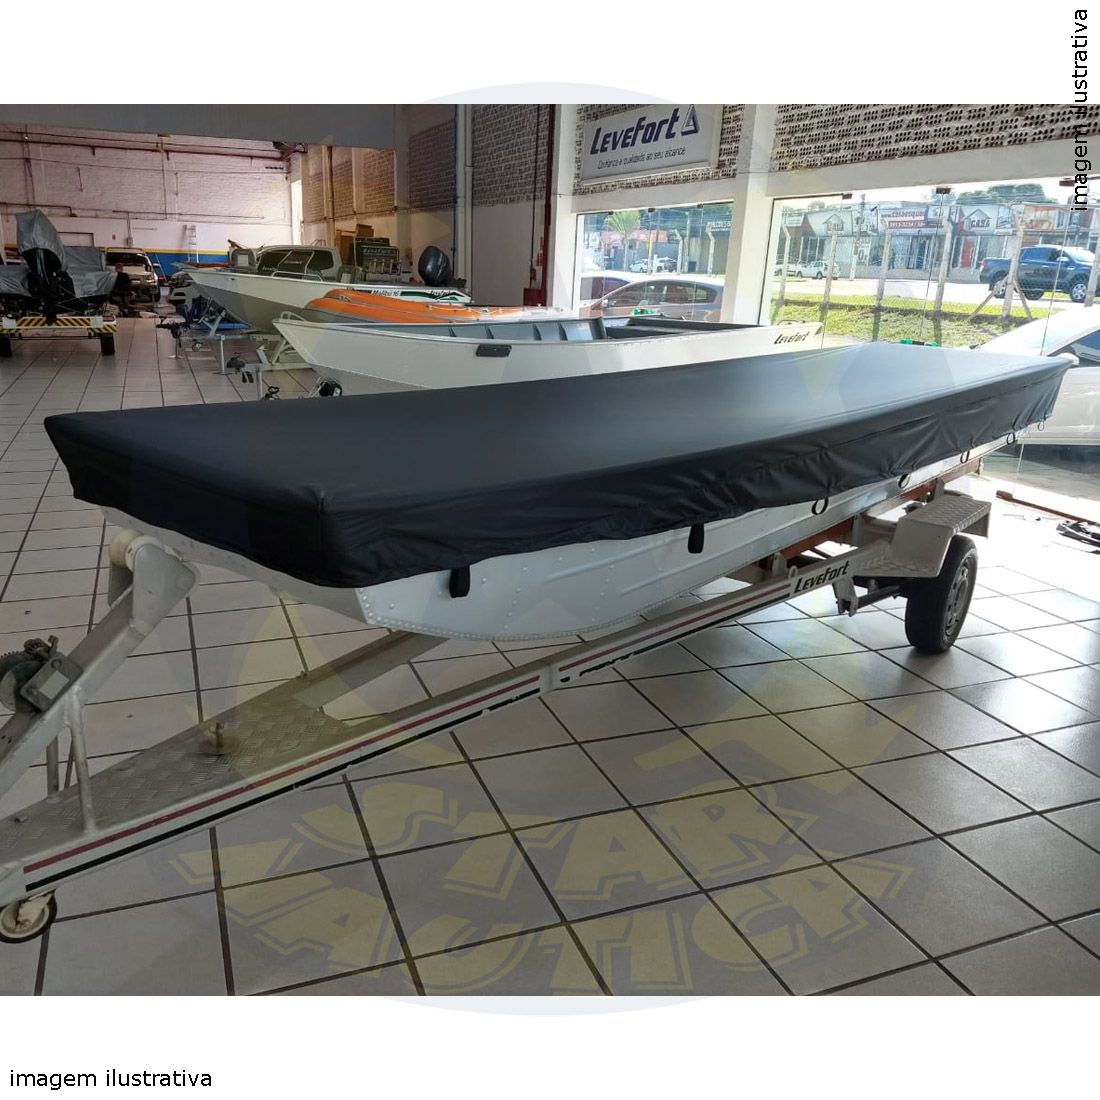 Capa Lona de Cobertura Barco Canoa Chato até 6mts Lona Poliéster